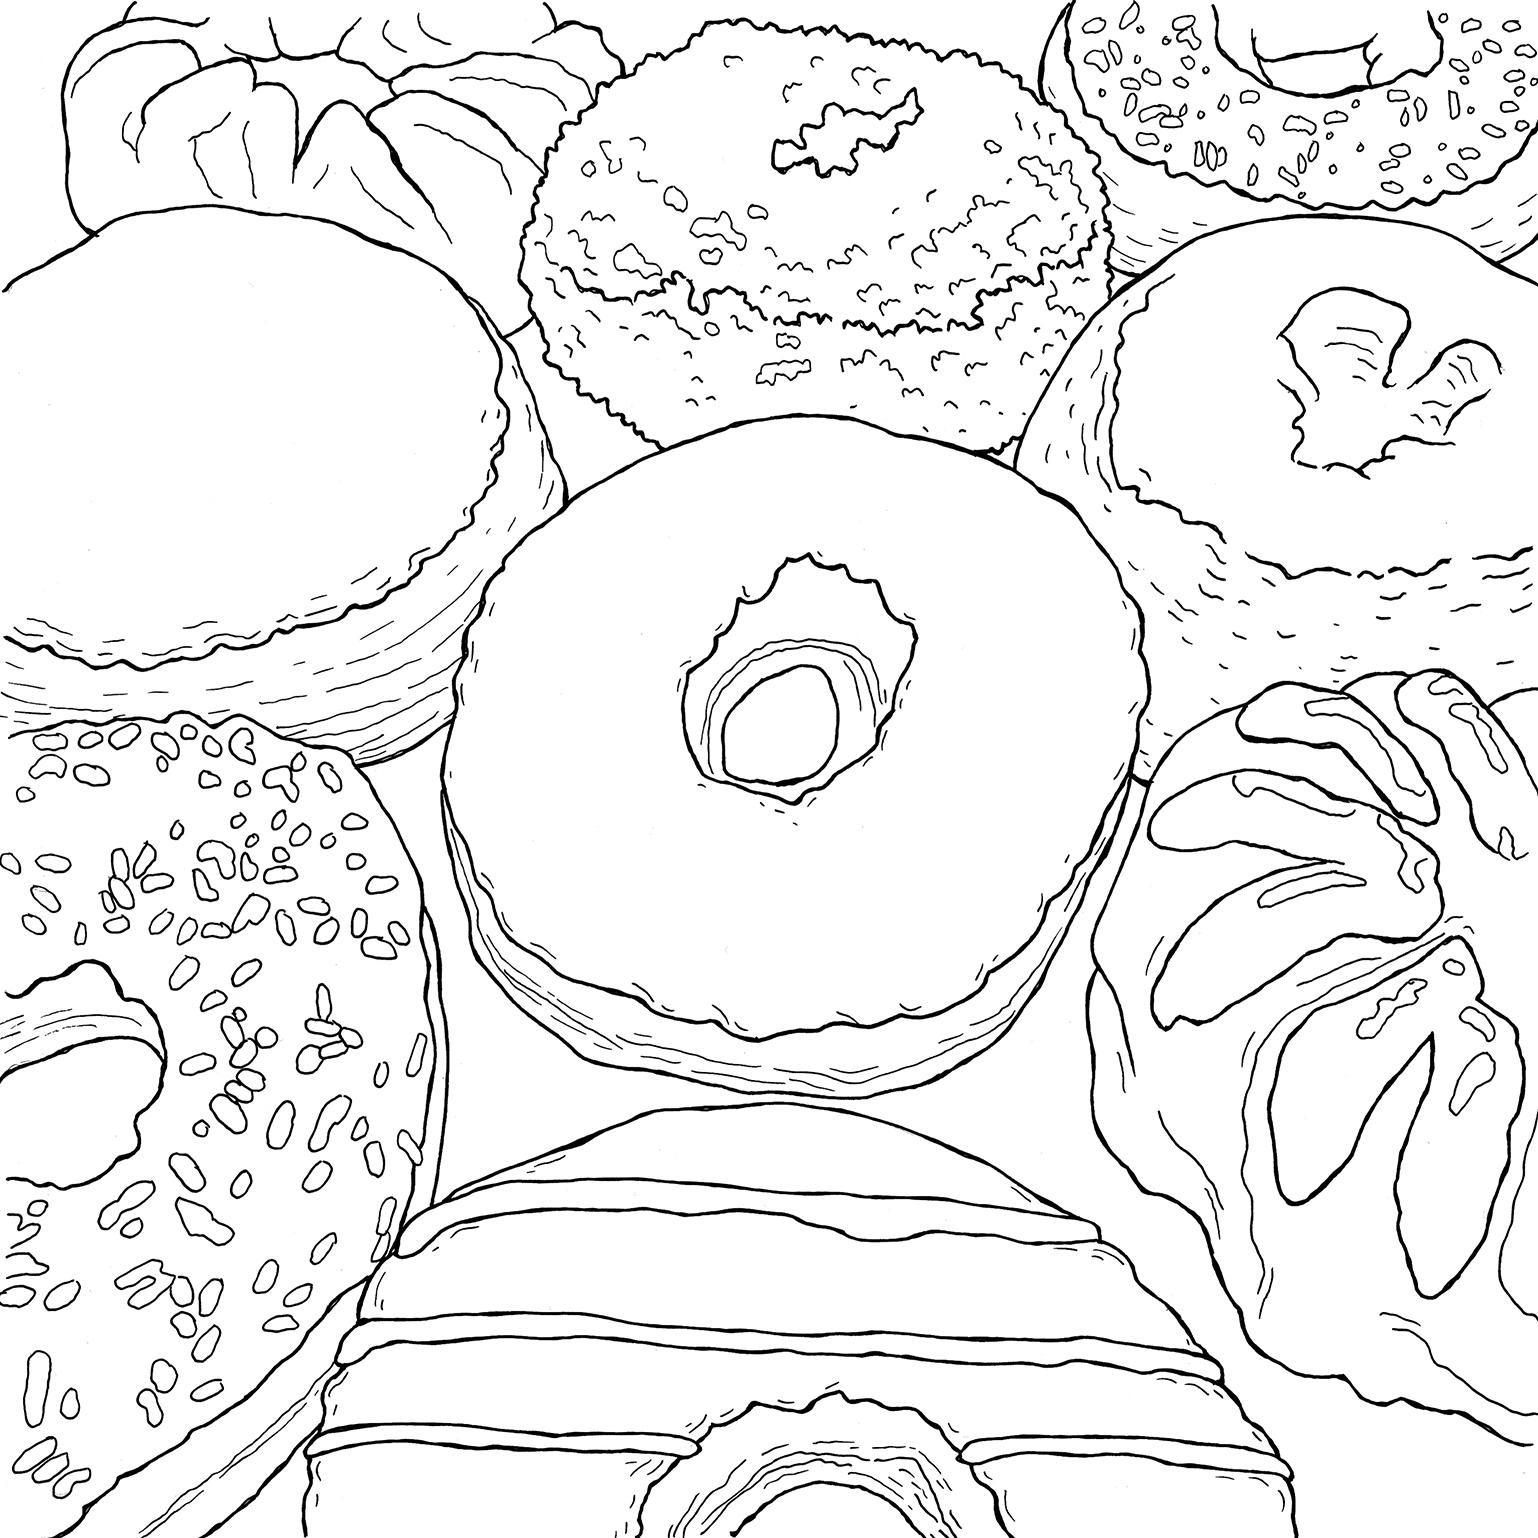 Arnold_Chicago_Donuts.jpg